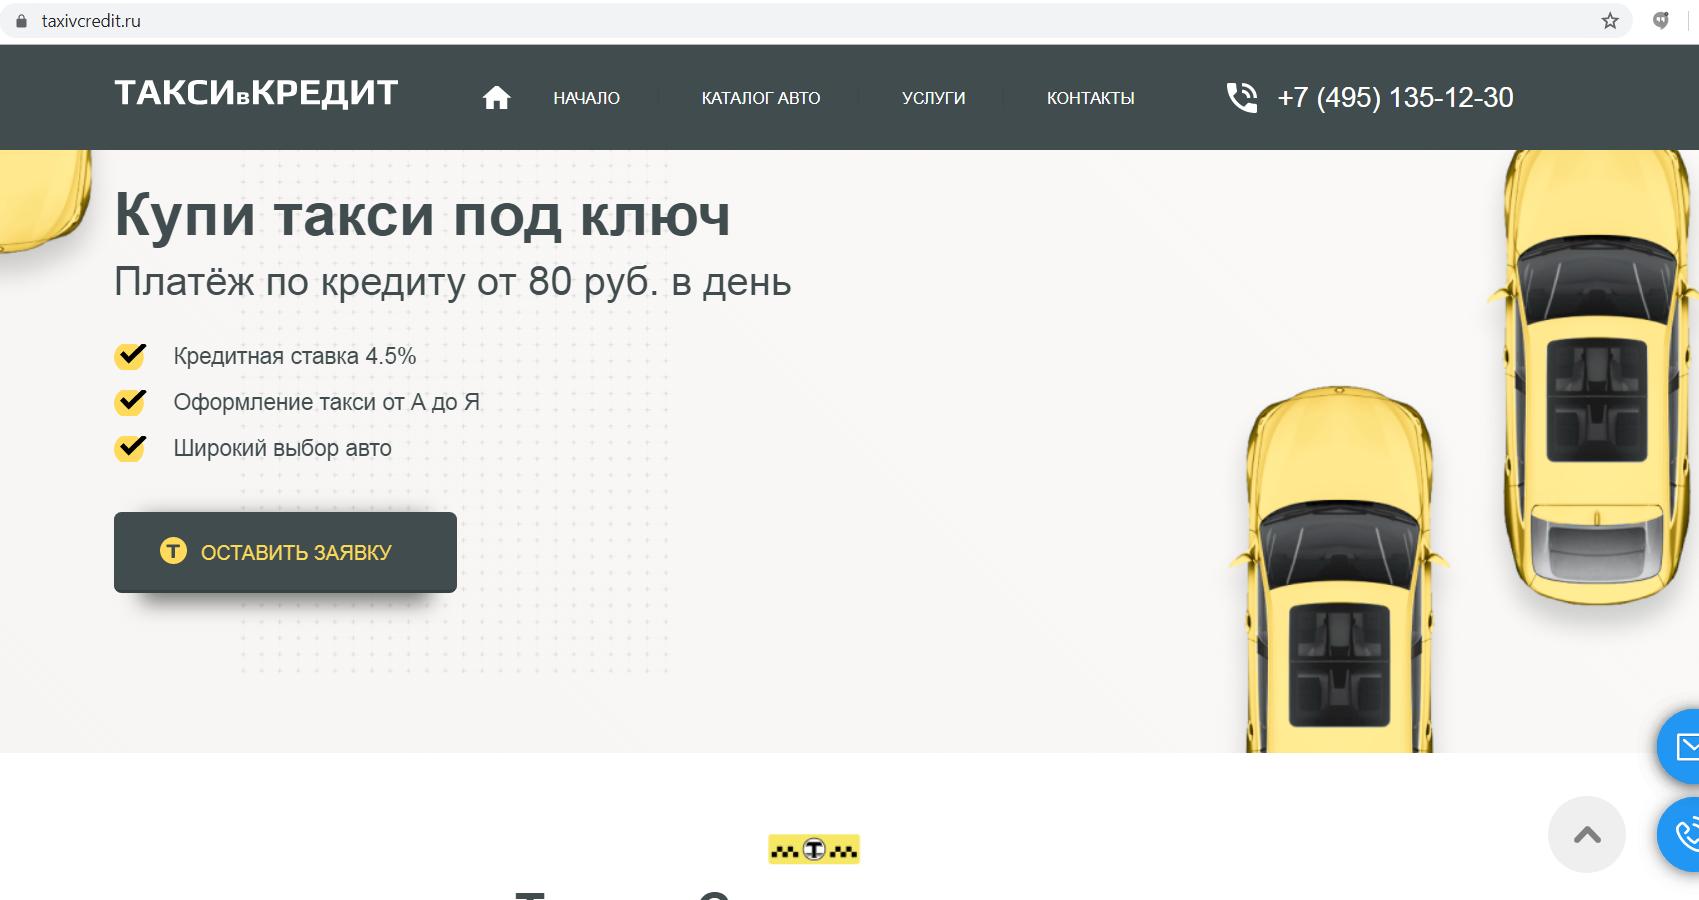 Сайт taxivcredit.ru